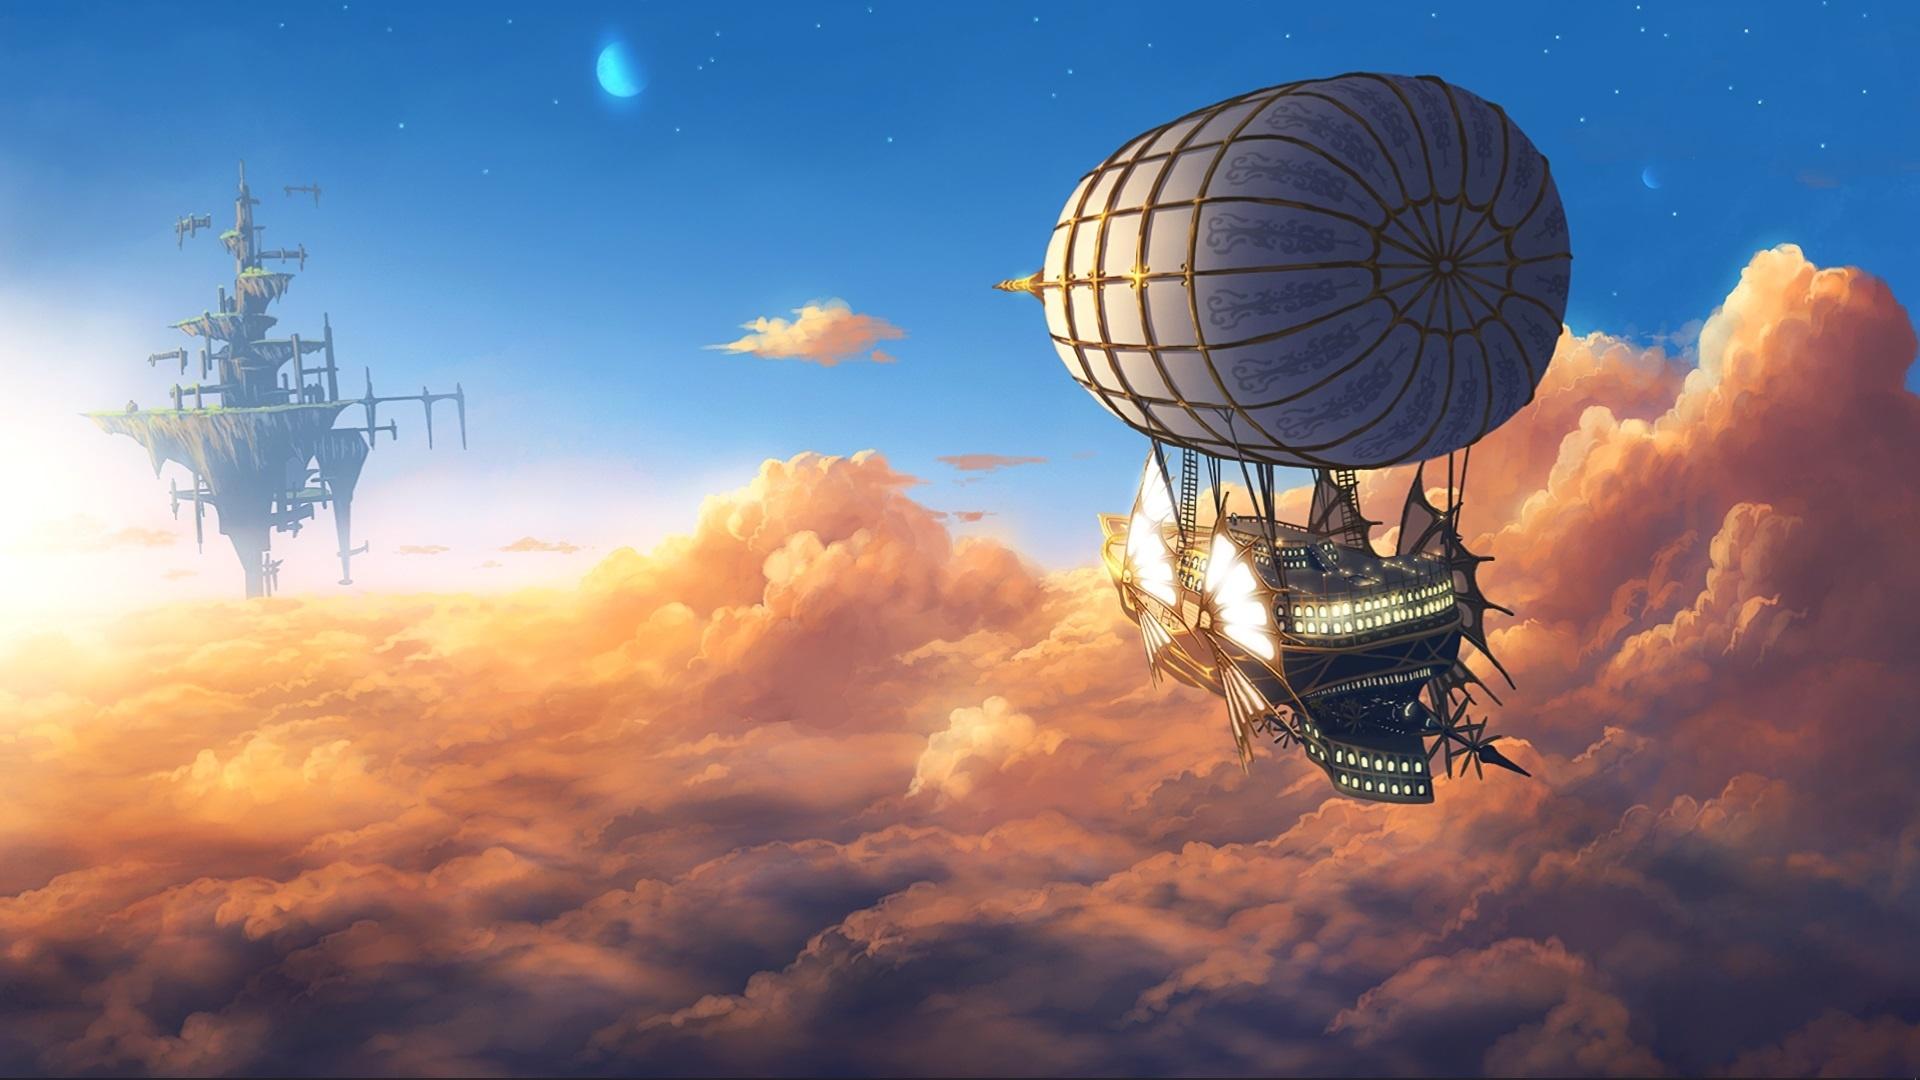 Airship Art Image